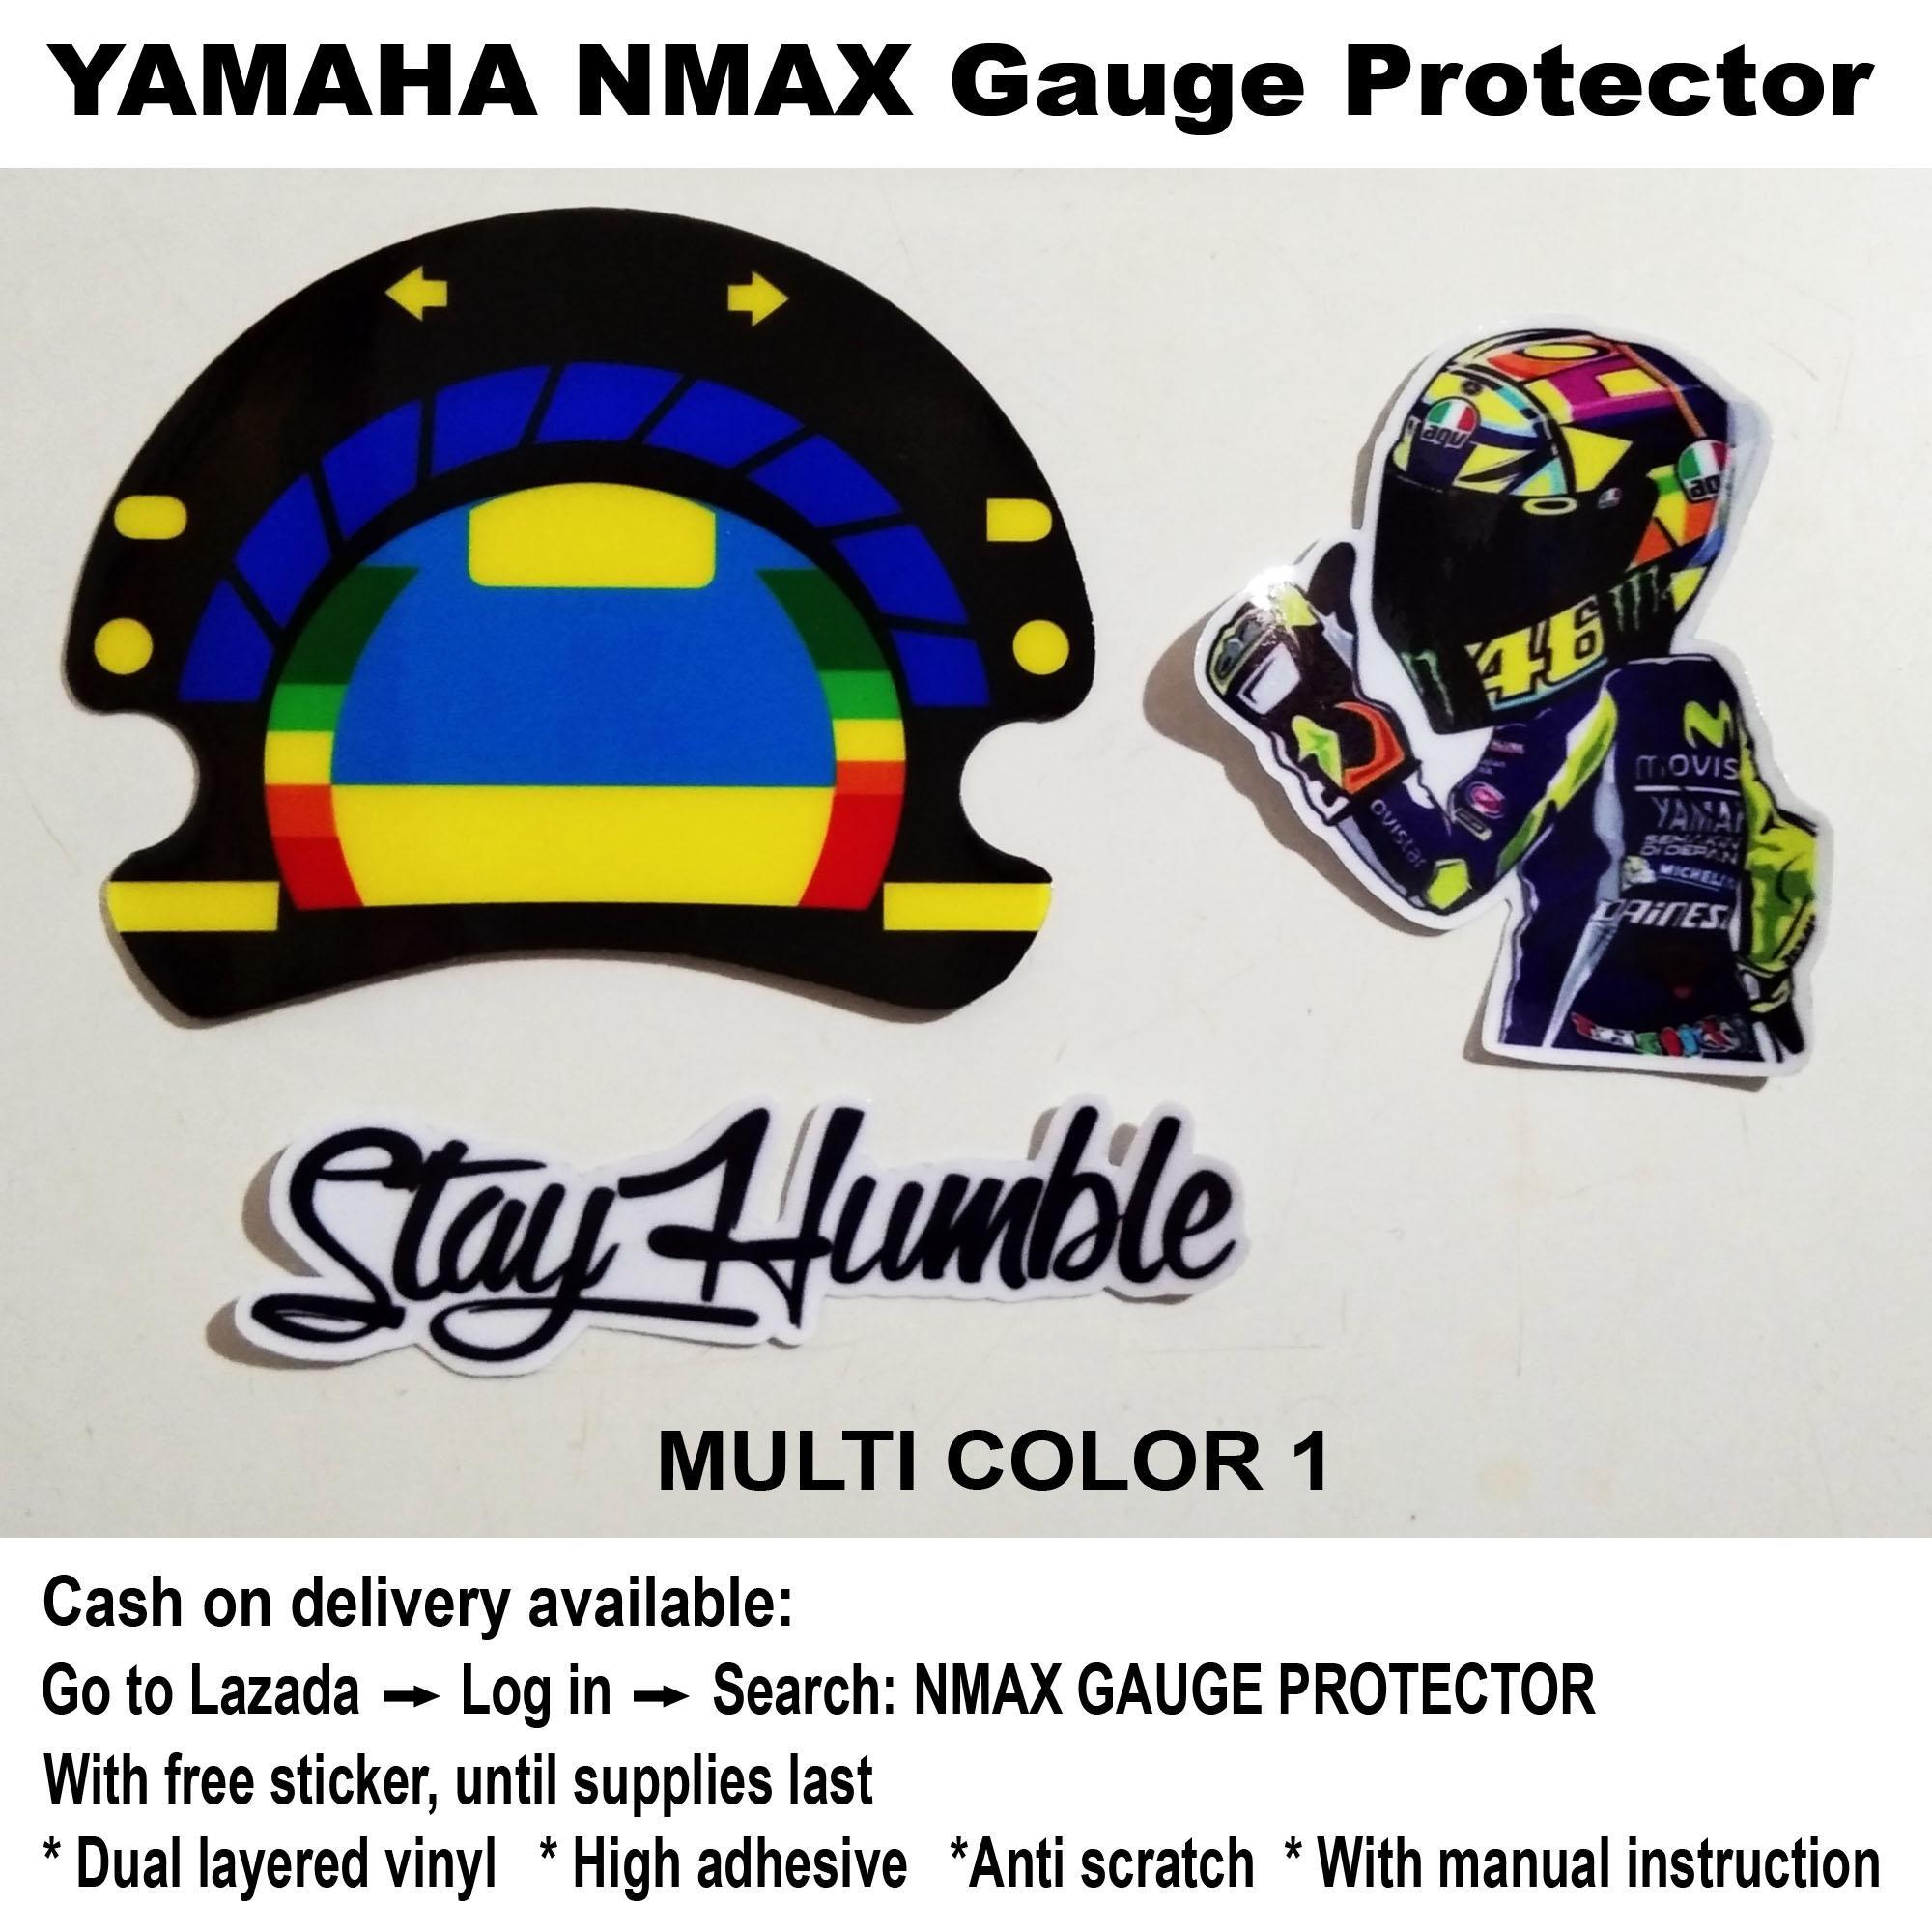 NMAX GAUGE PROTECTOR (MULTI COLOR 1)